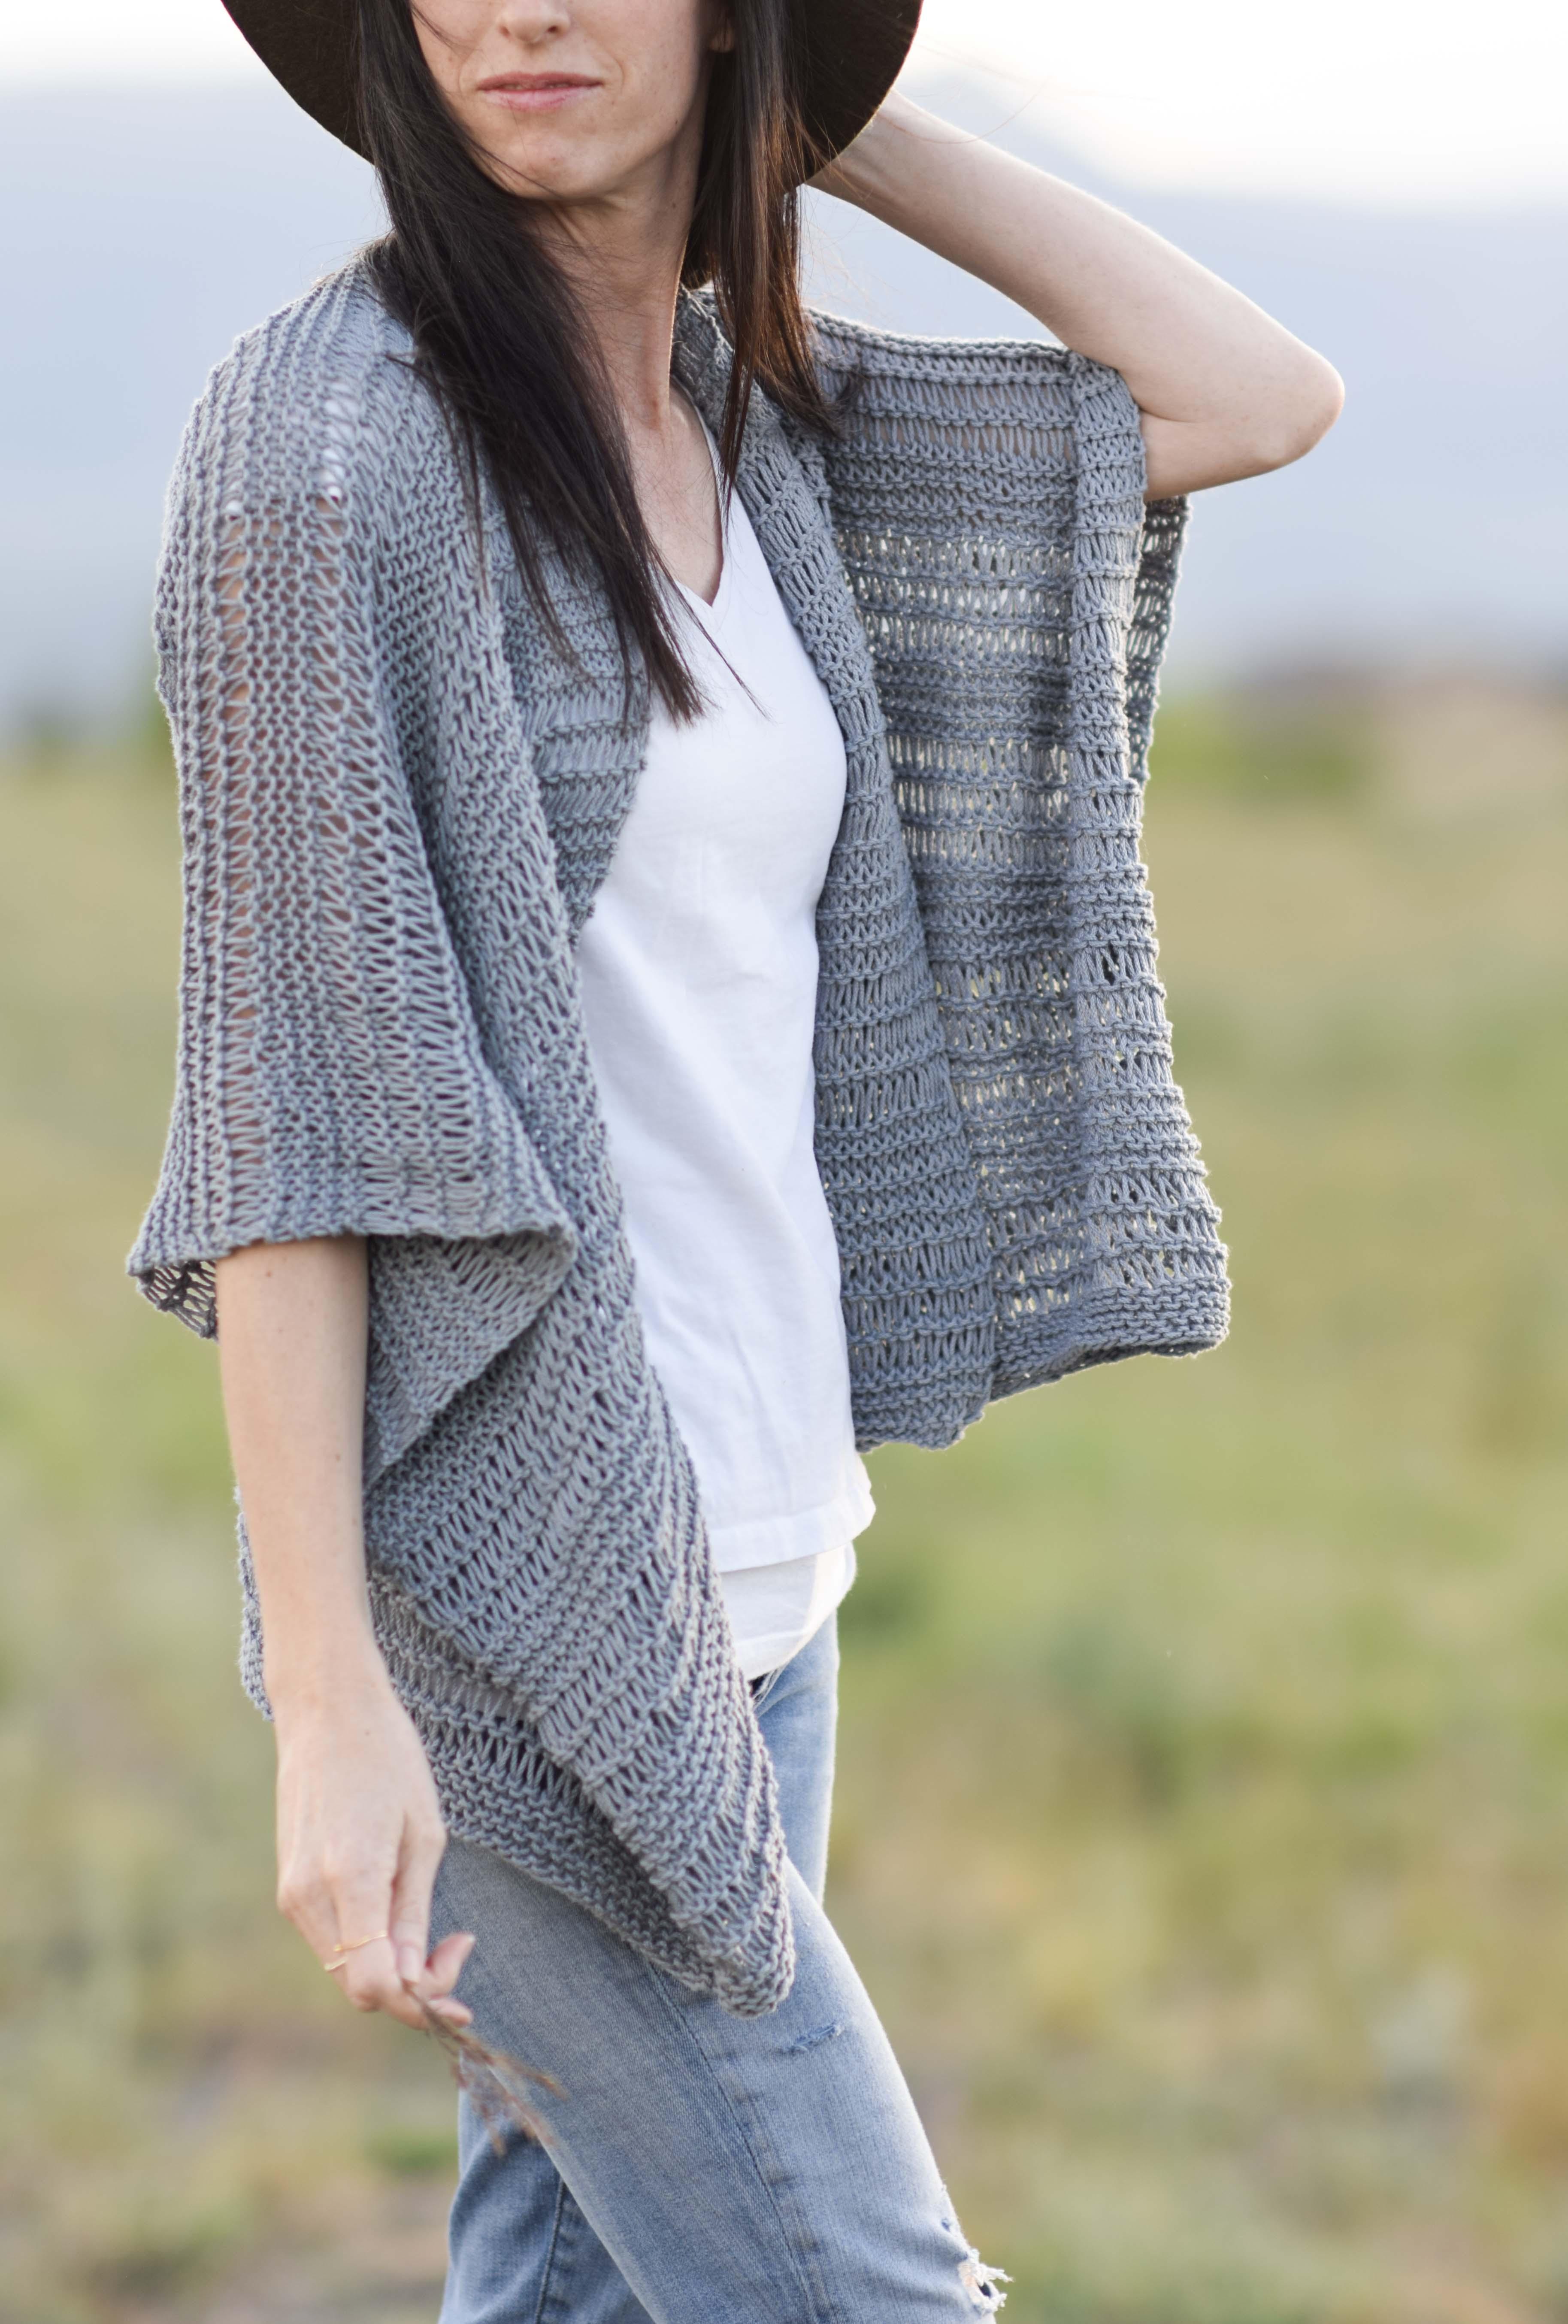 Drop Stitch Cotton Easy Kimono Knitting Pattern – Mama In A